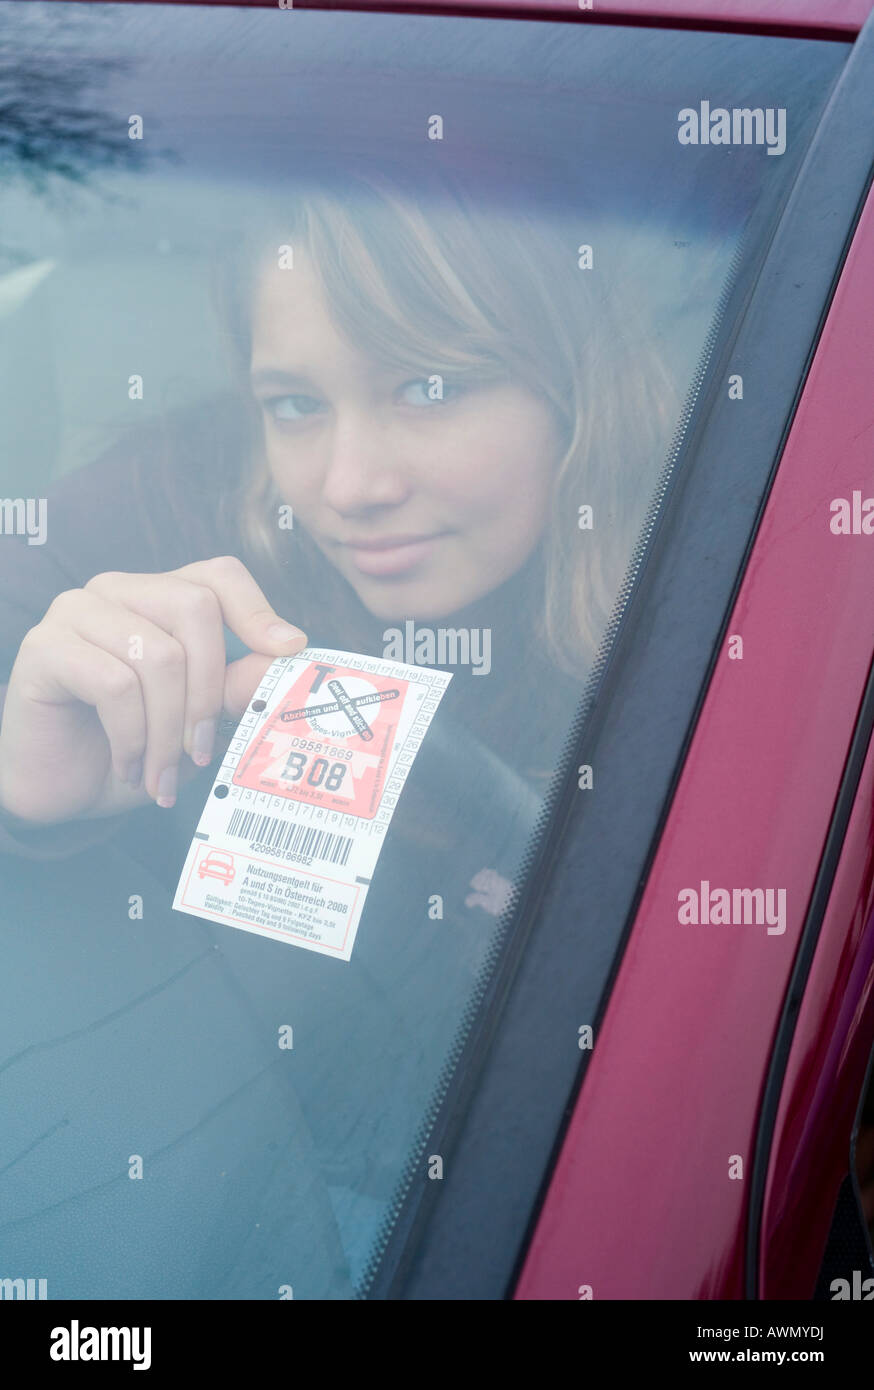 Austrian vignette for 2008 (highway toll sticker), Austria, Europe - Stock Image